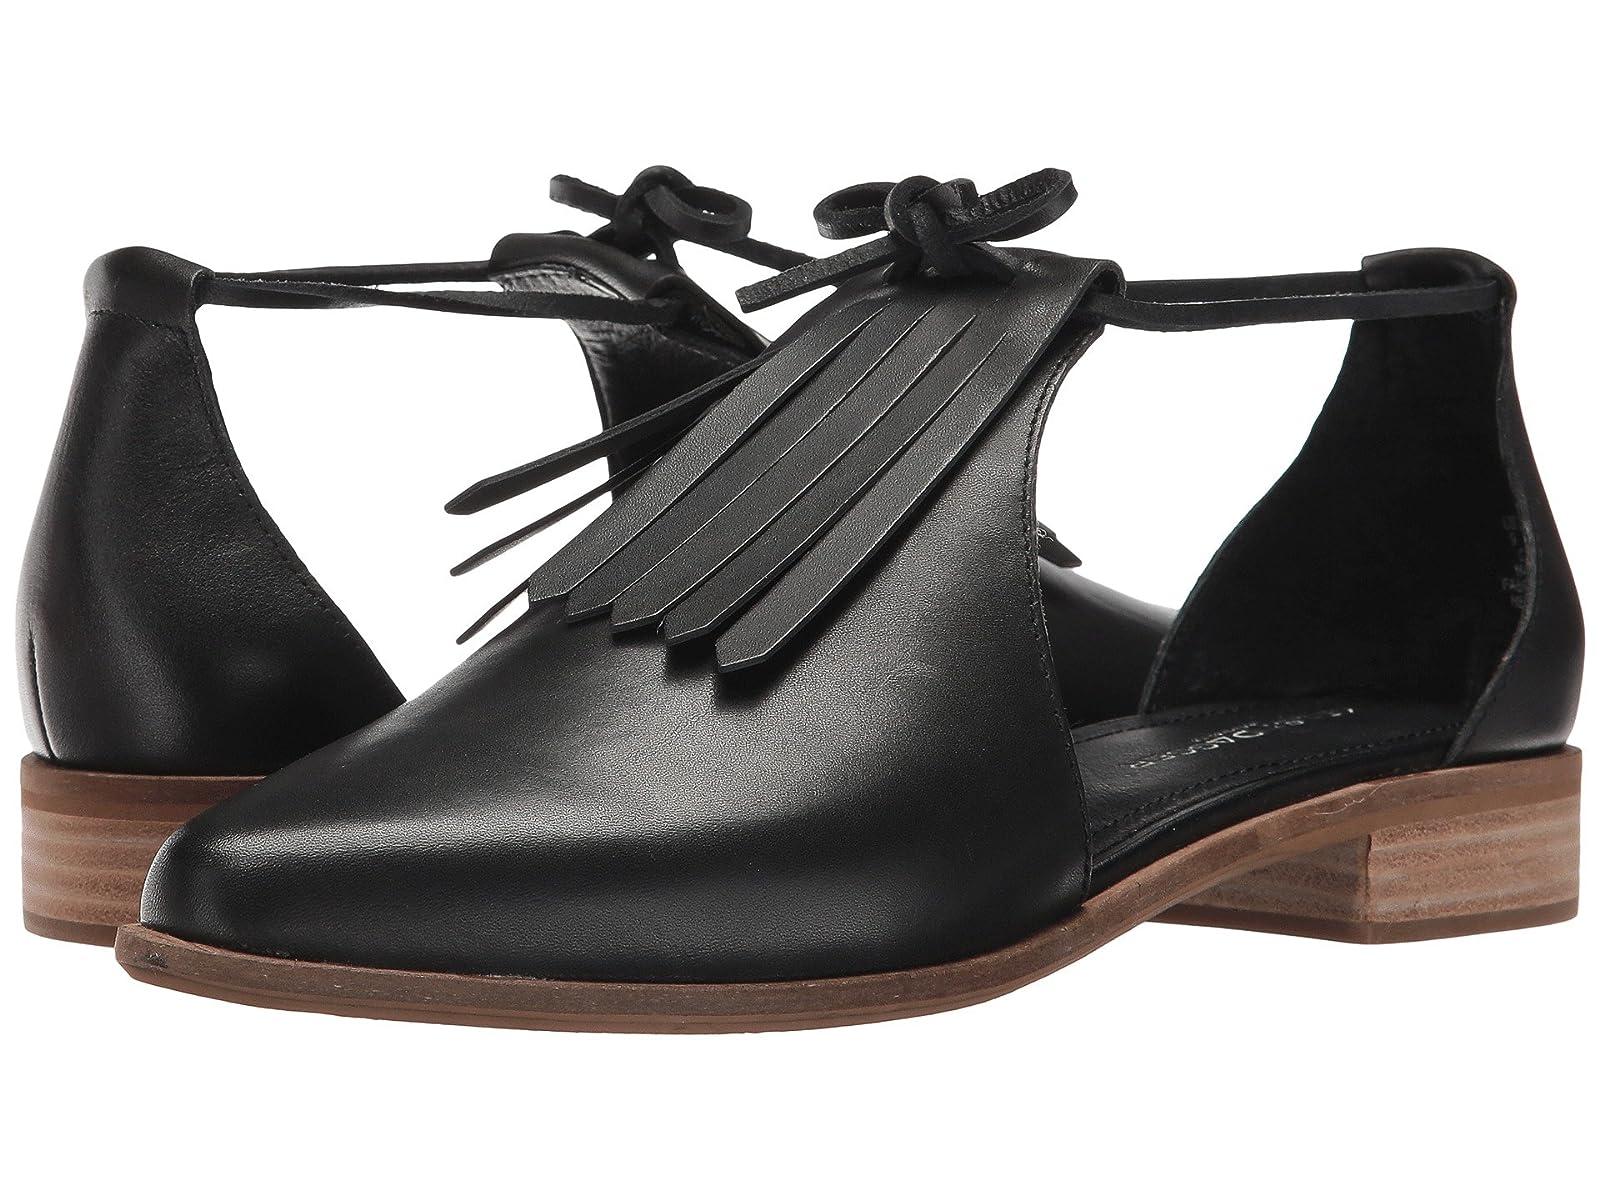 Kelsi Dagger Brooklyn AlaniCheap and distinctive eye-catching shoes